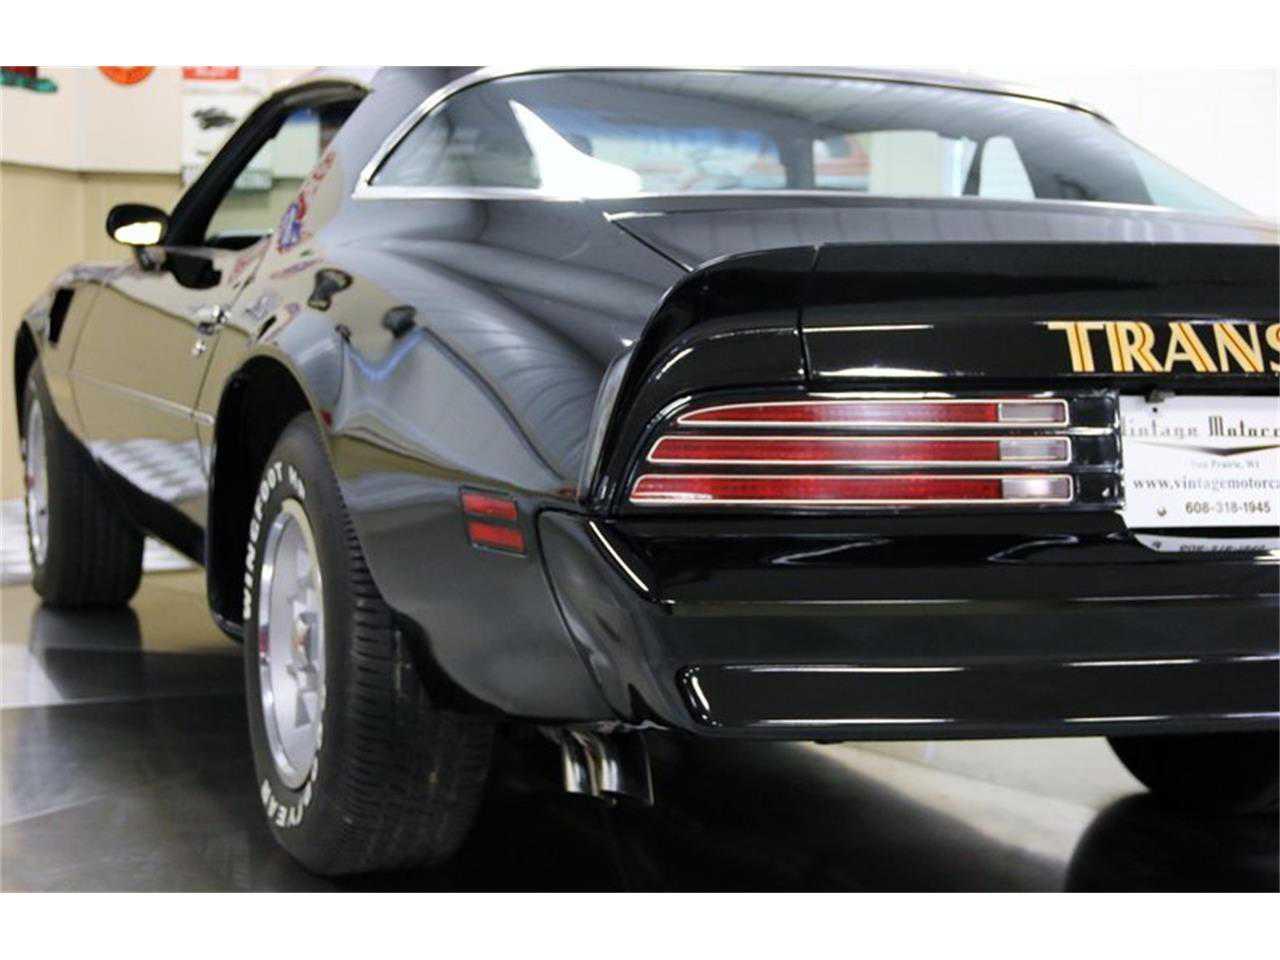 1976 pontiac firebird trans am for sale in sun prairie wi 1945 Pontiac Coupe prev